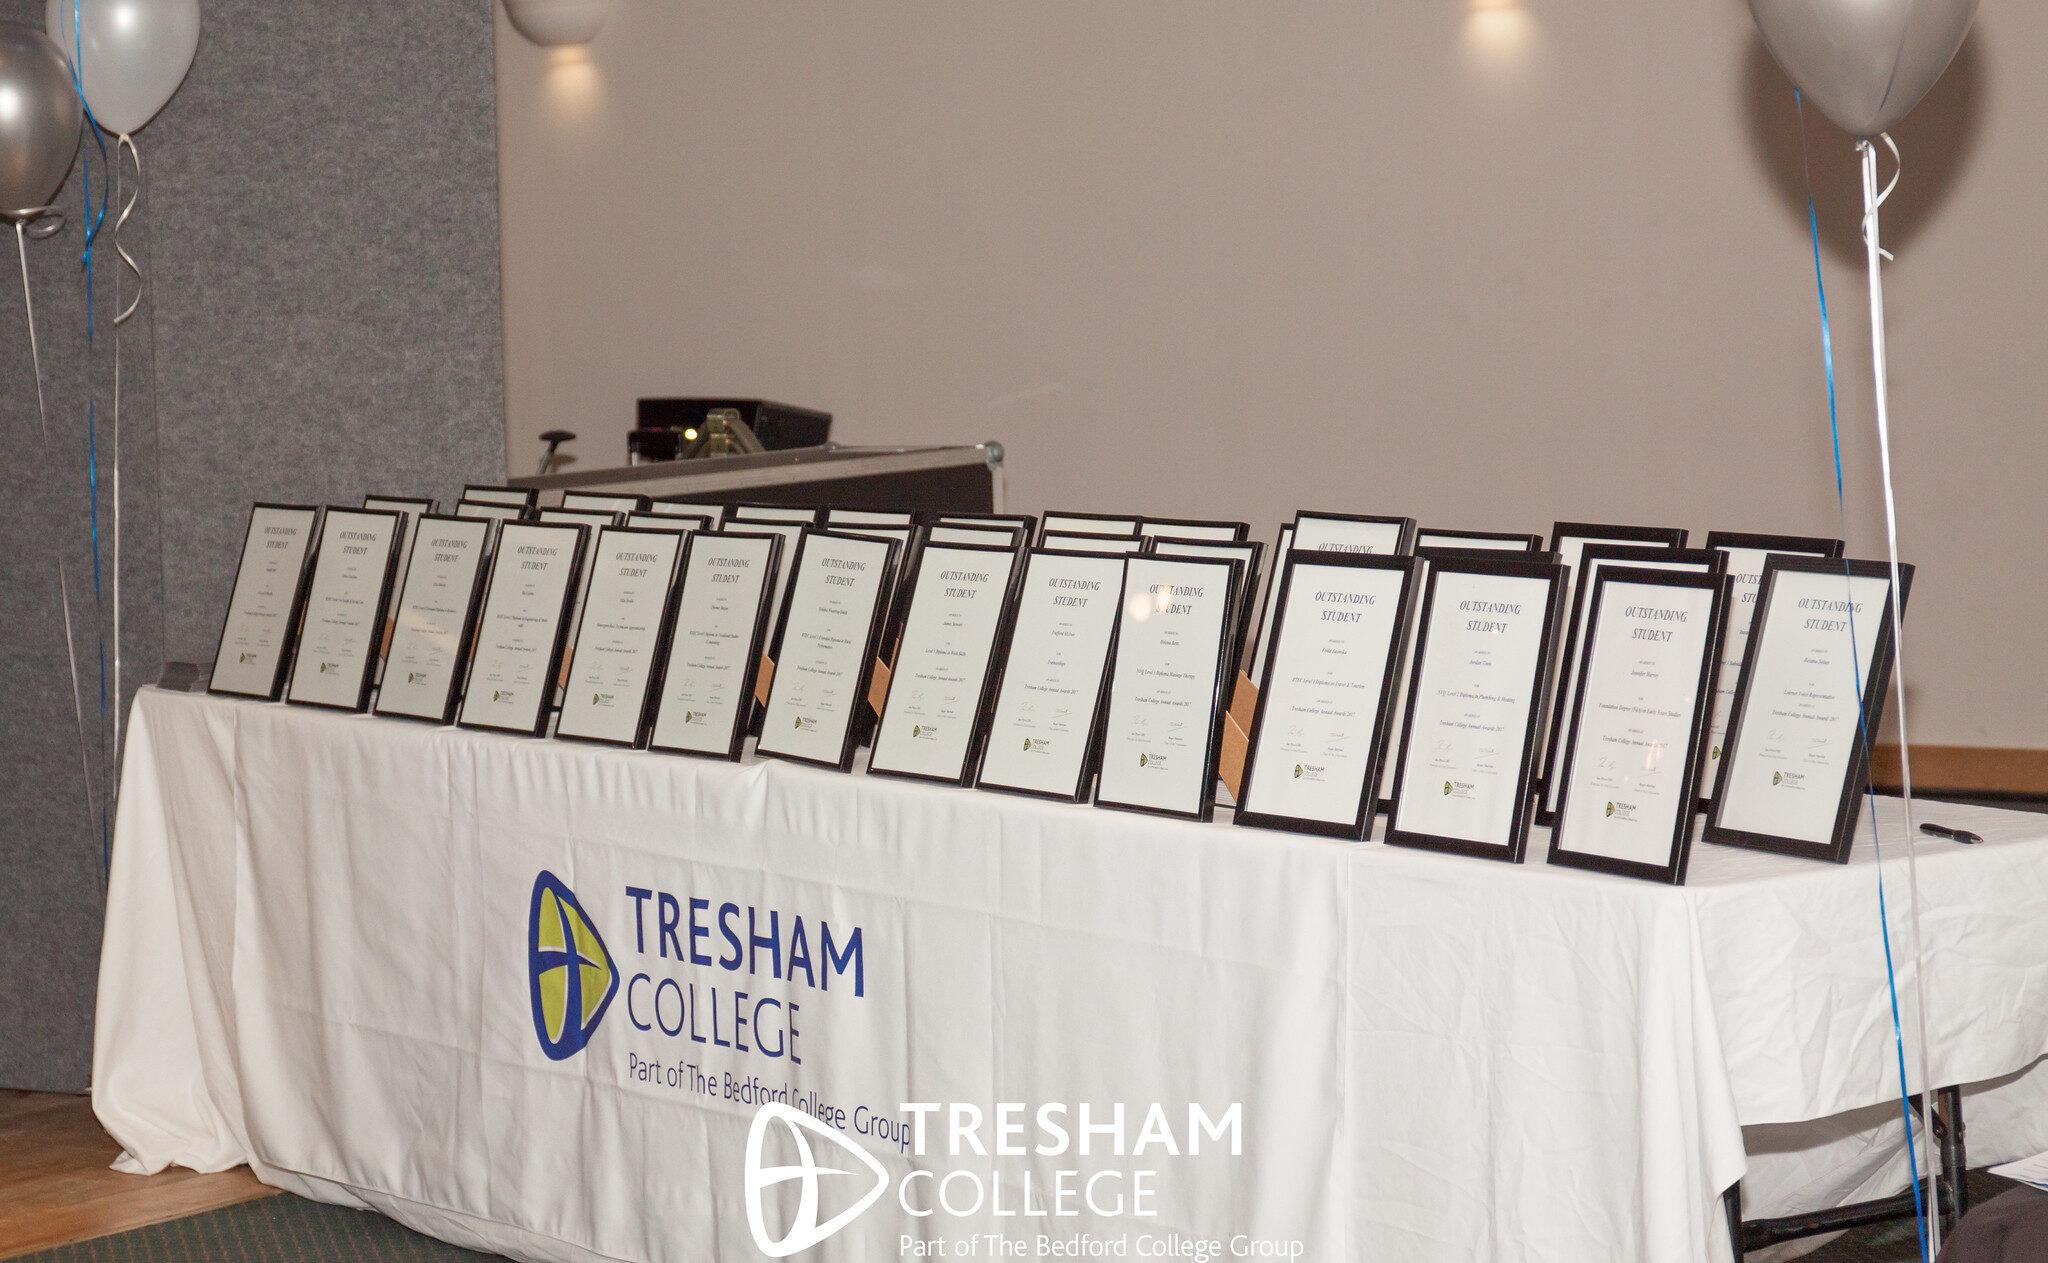 Tresham College Achievements Ceremony 2017